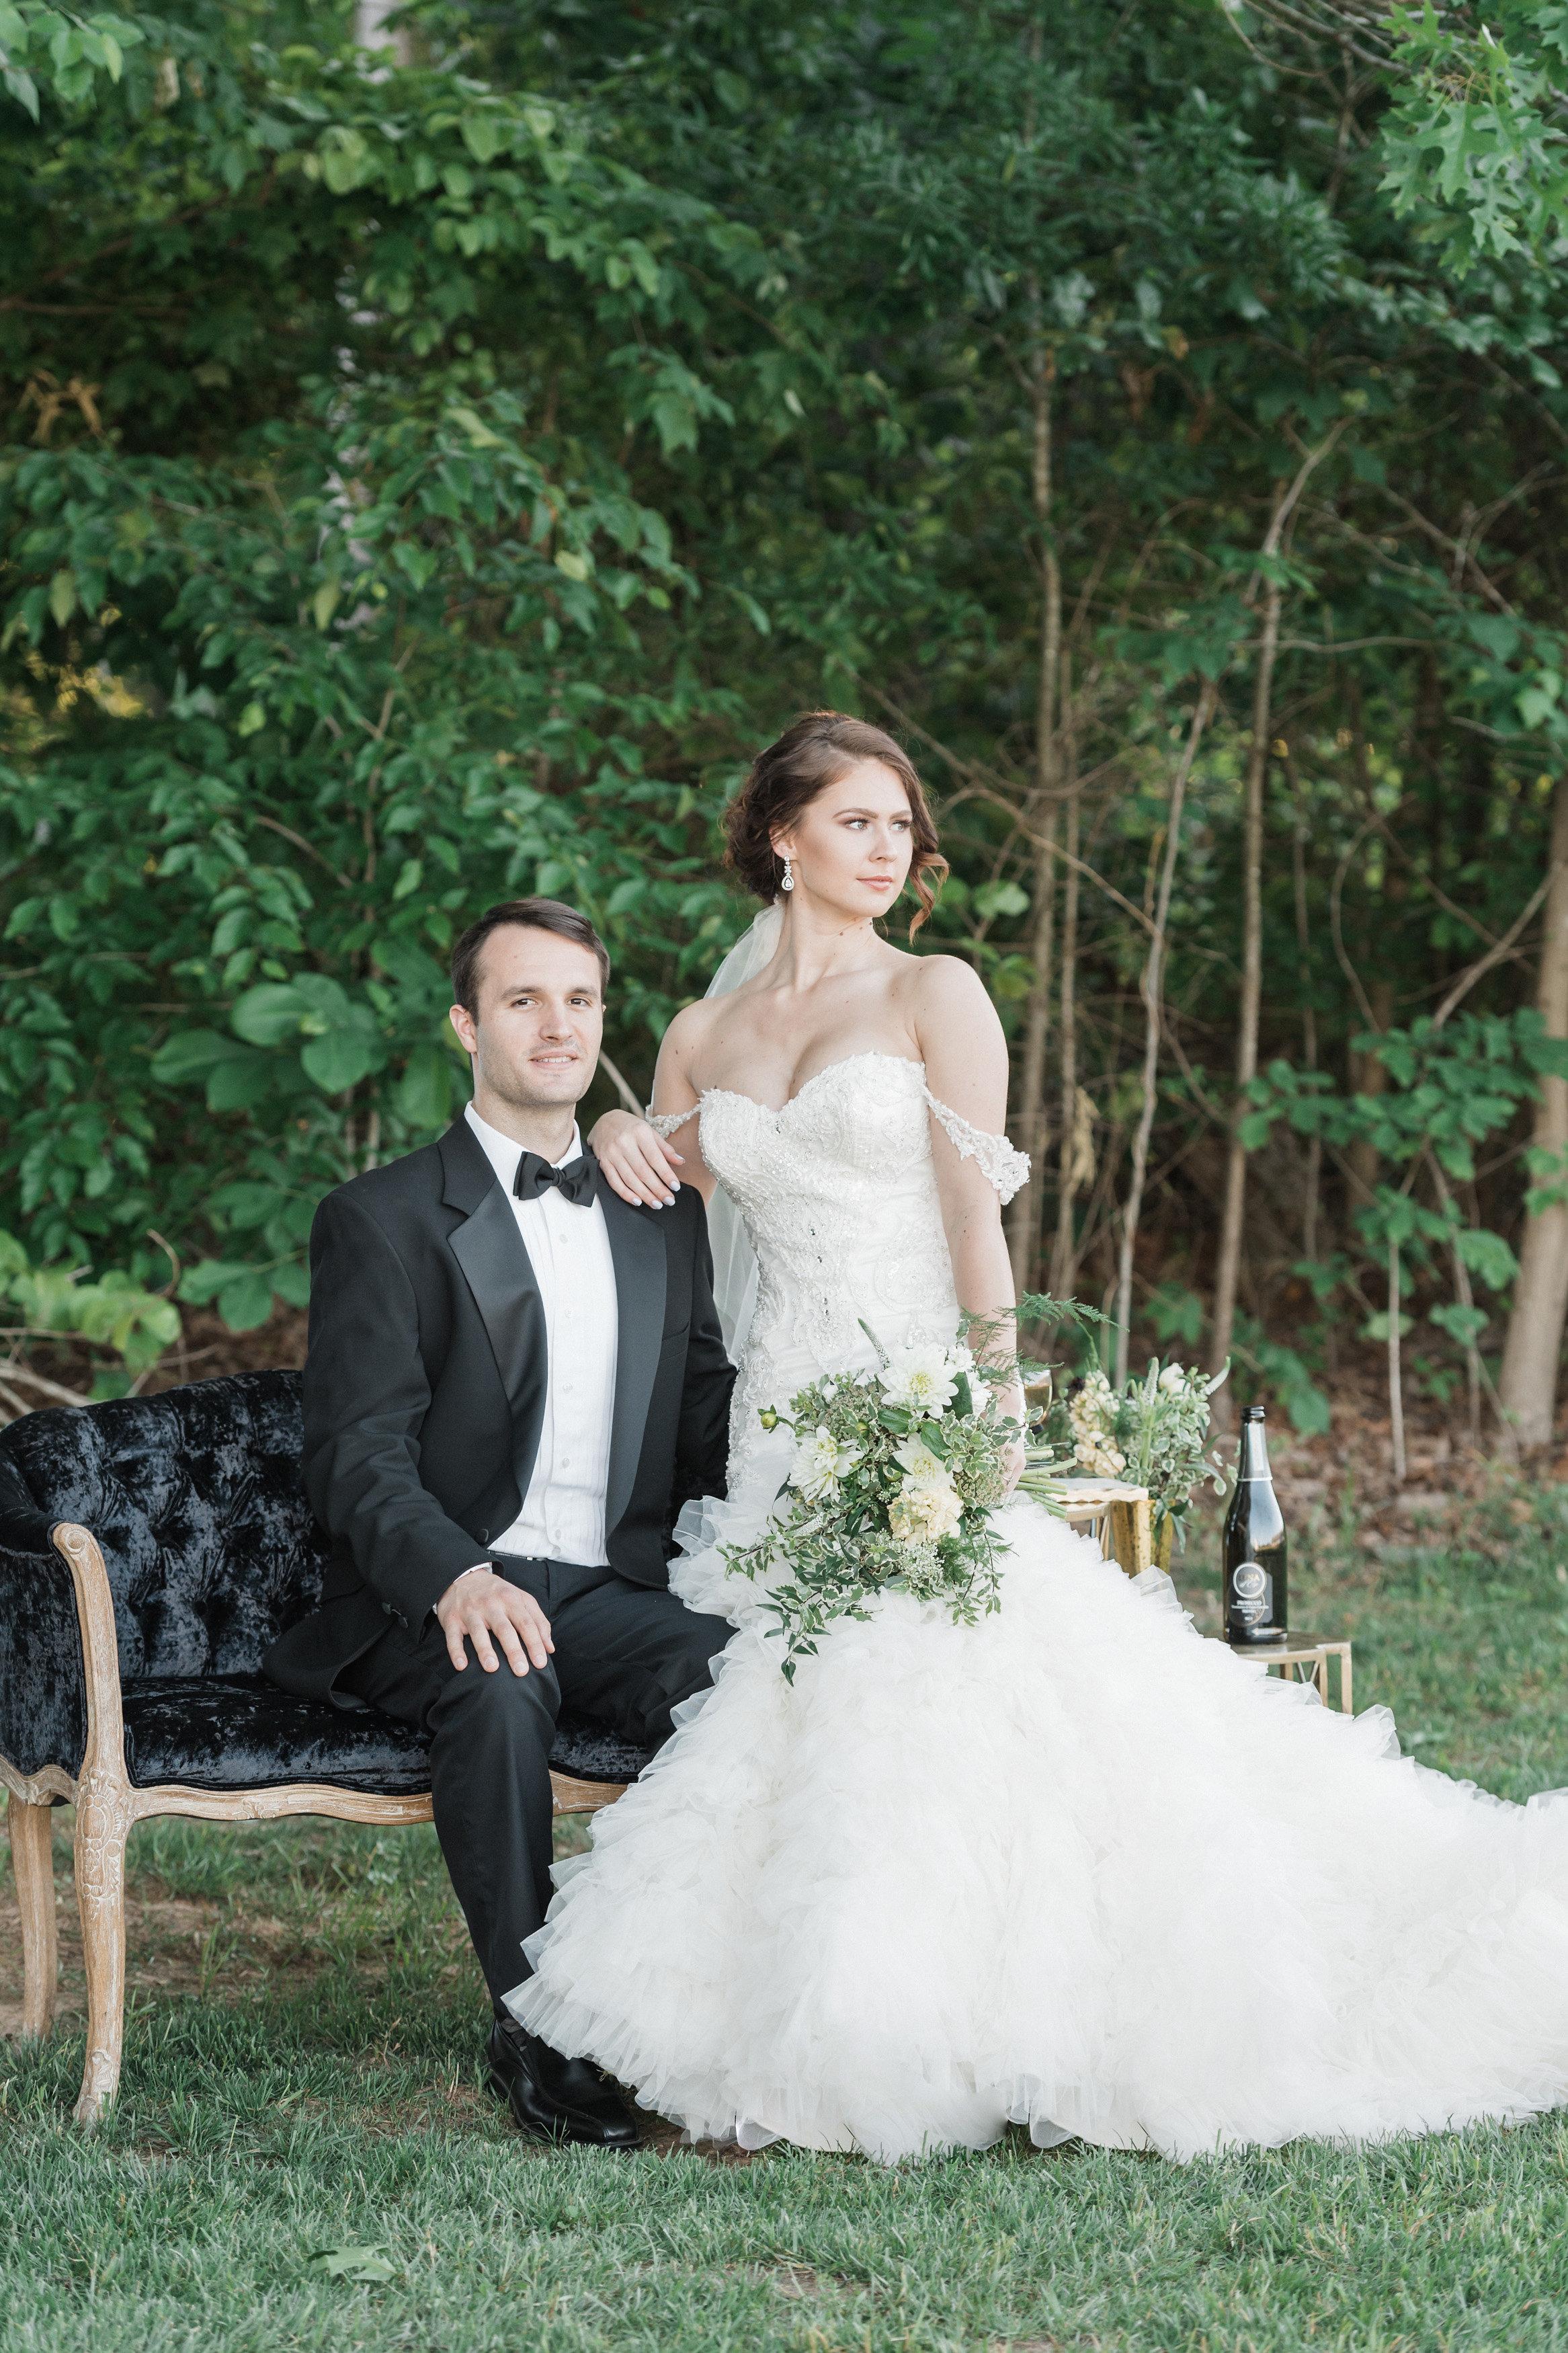 Elegant Amp Glam Country Wedding Inspiration Rustic Wedding Chic